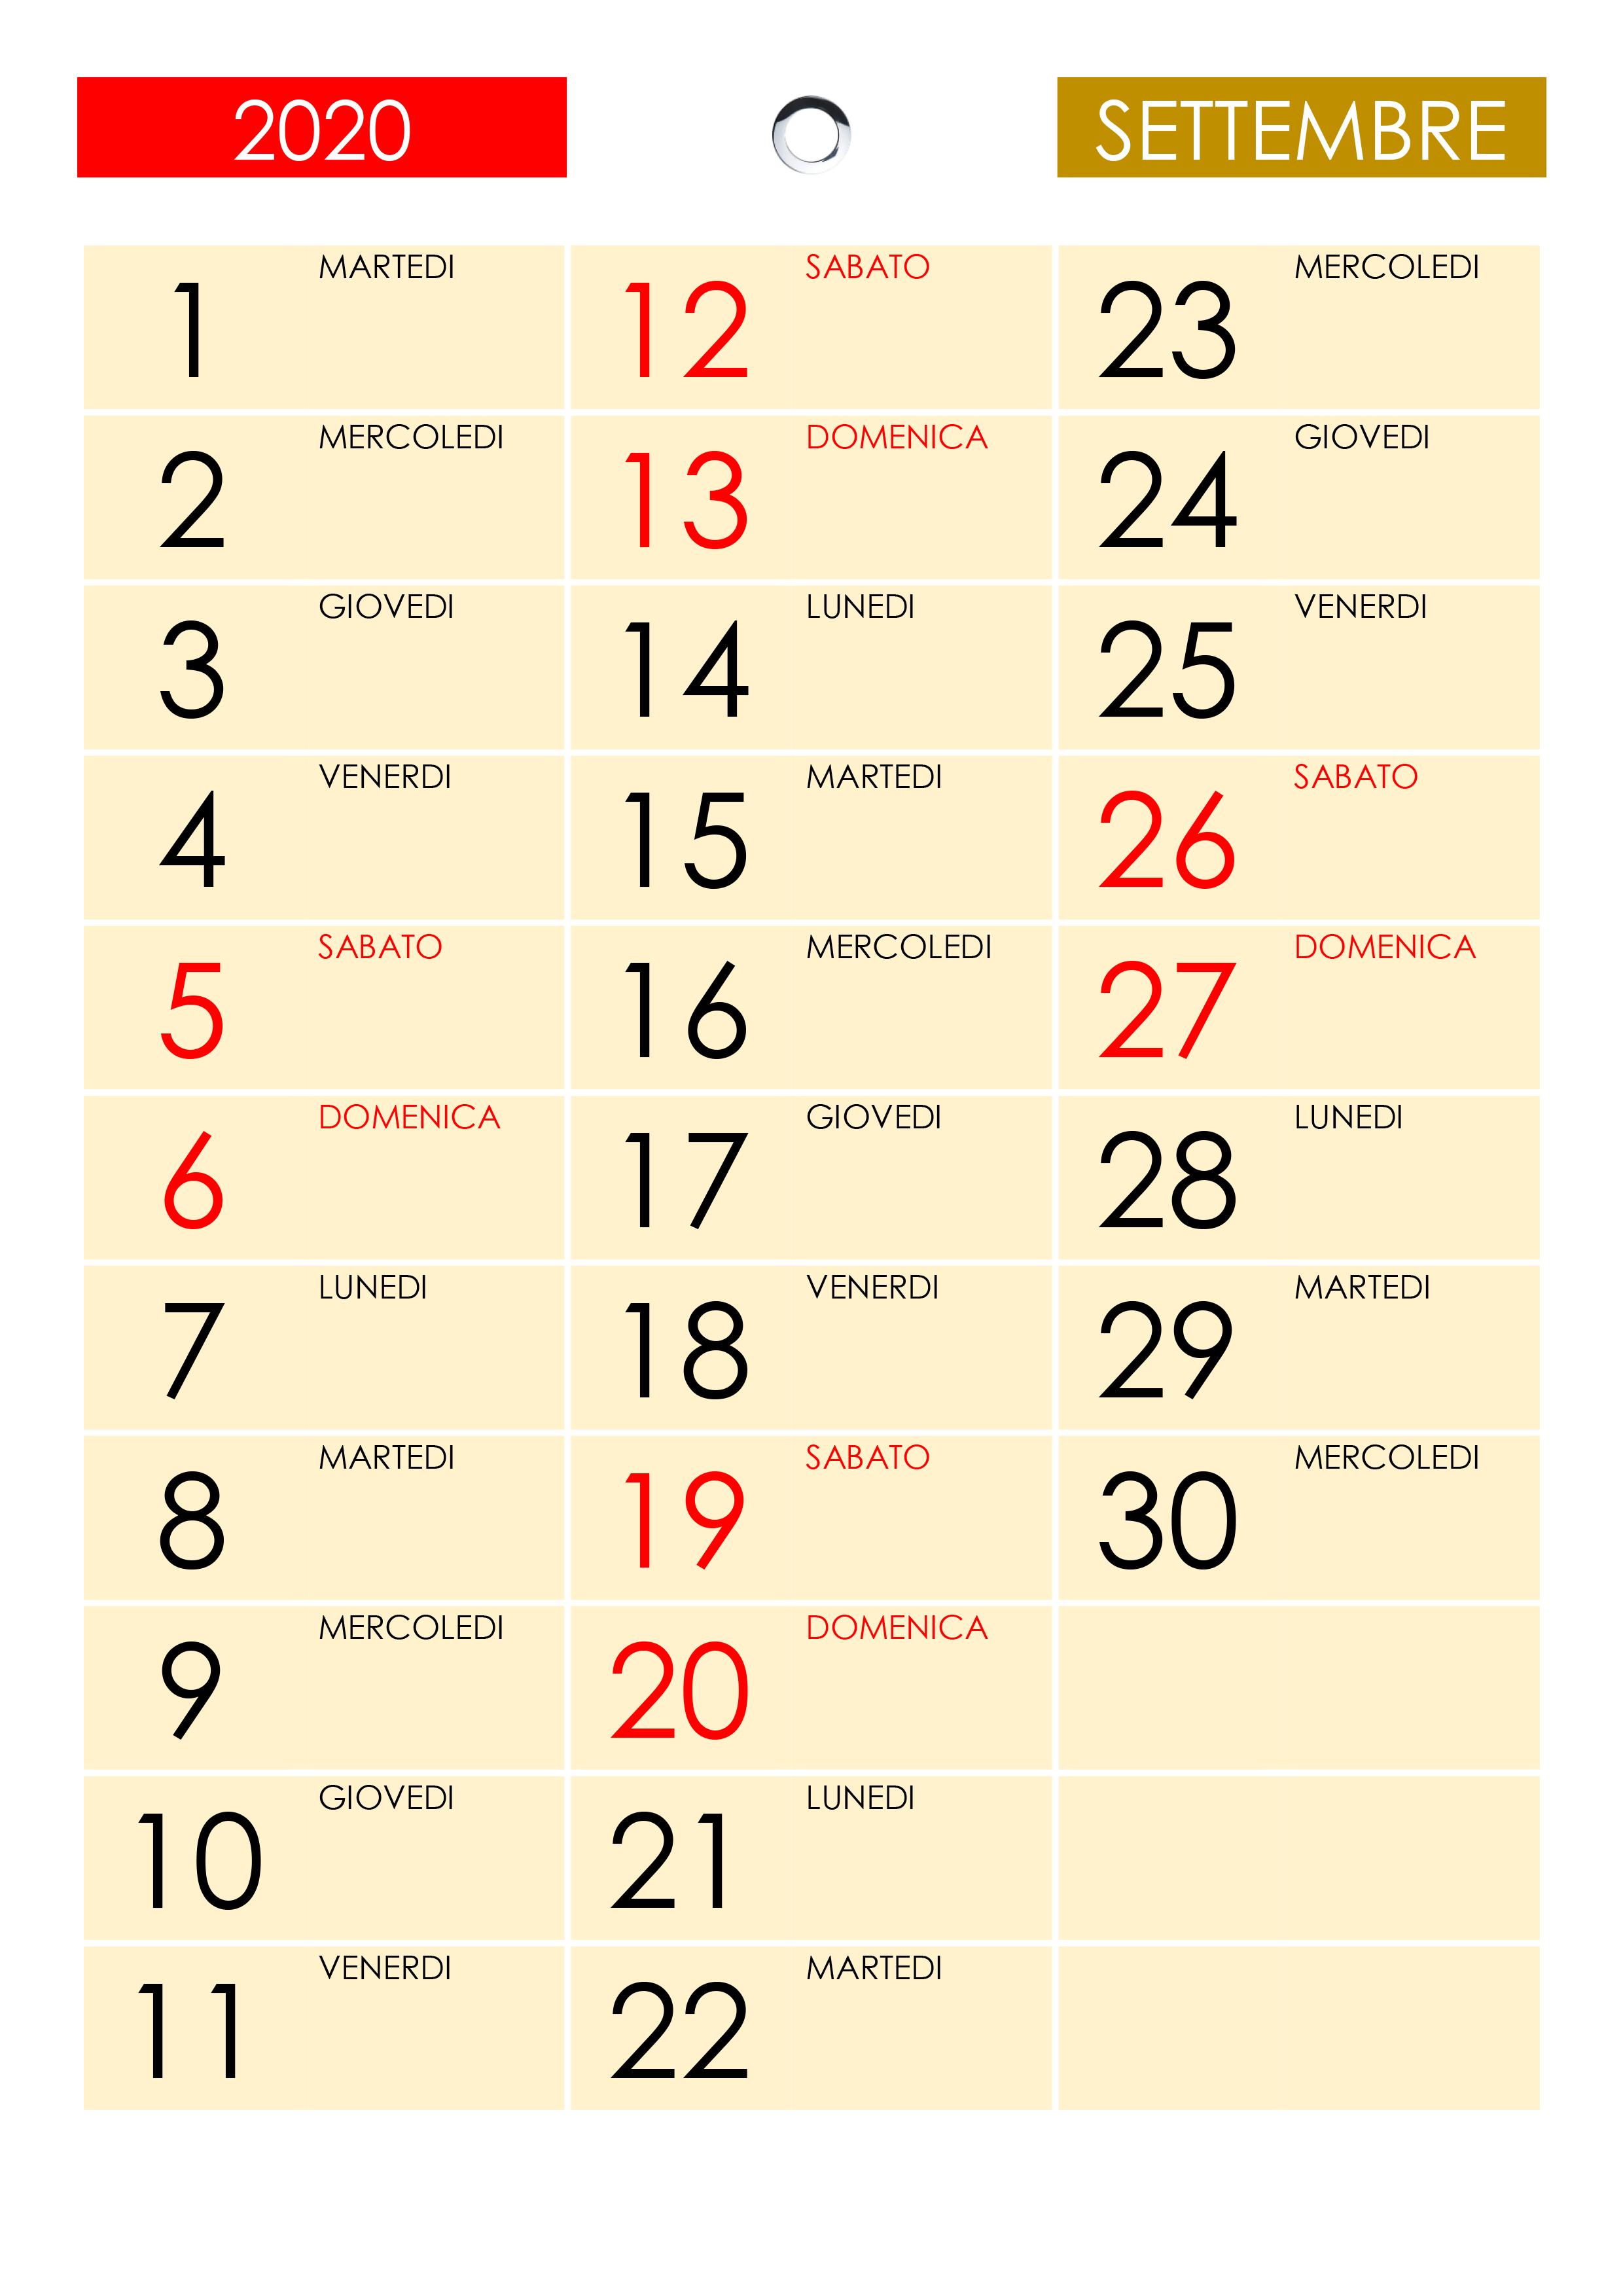 Calendario Settembre2020.Calendario Settembre 2020 Calendario Su